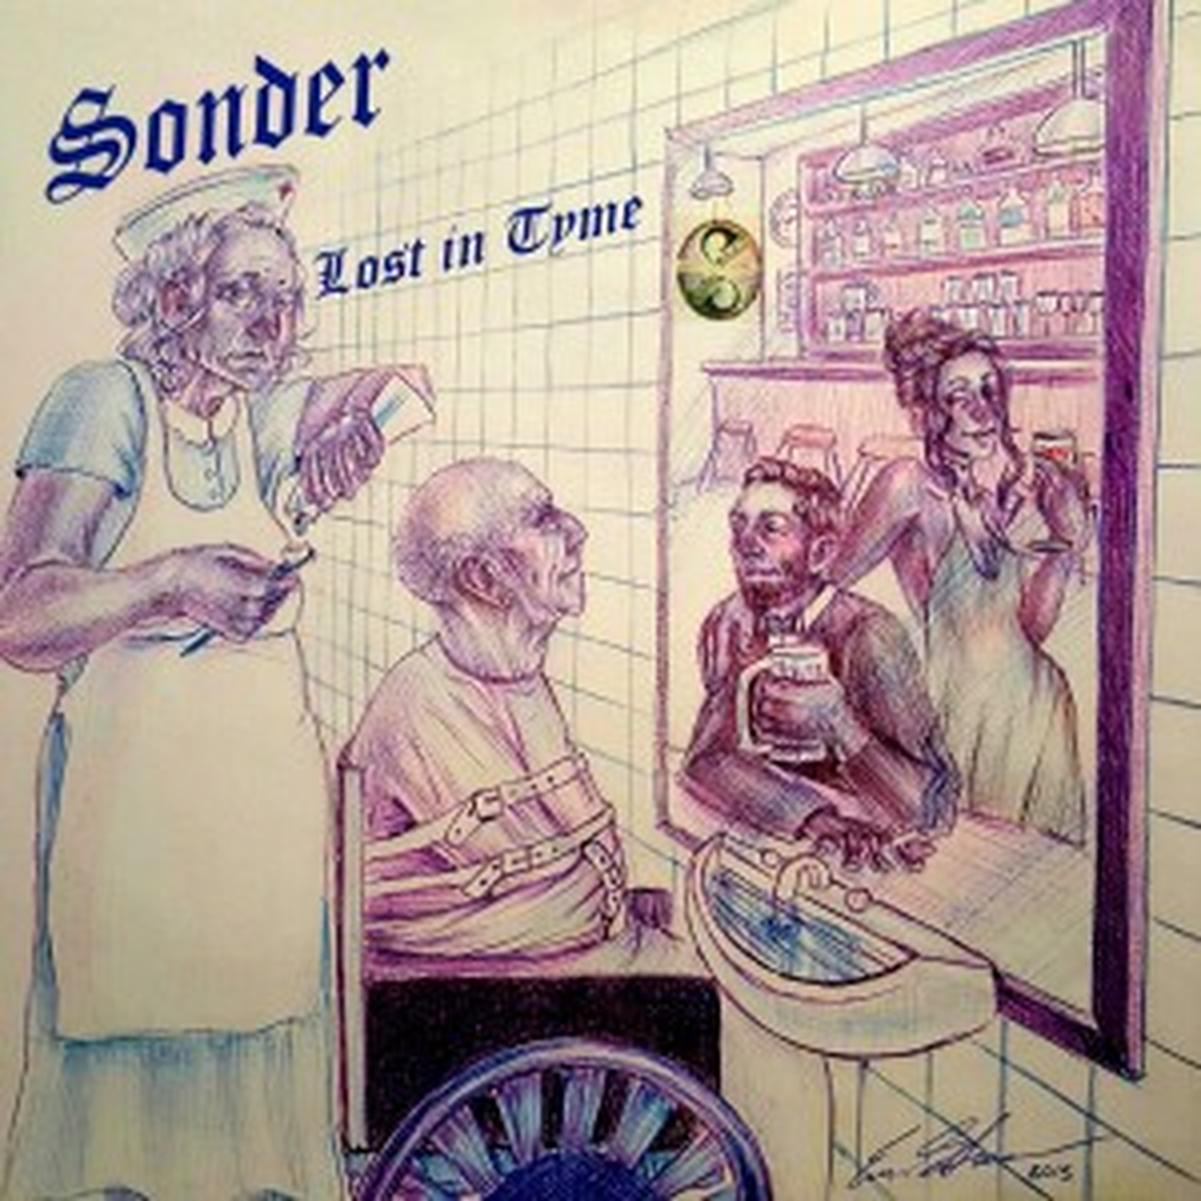 Sonder wiki, Sonder review, Sonder history, Sonder news